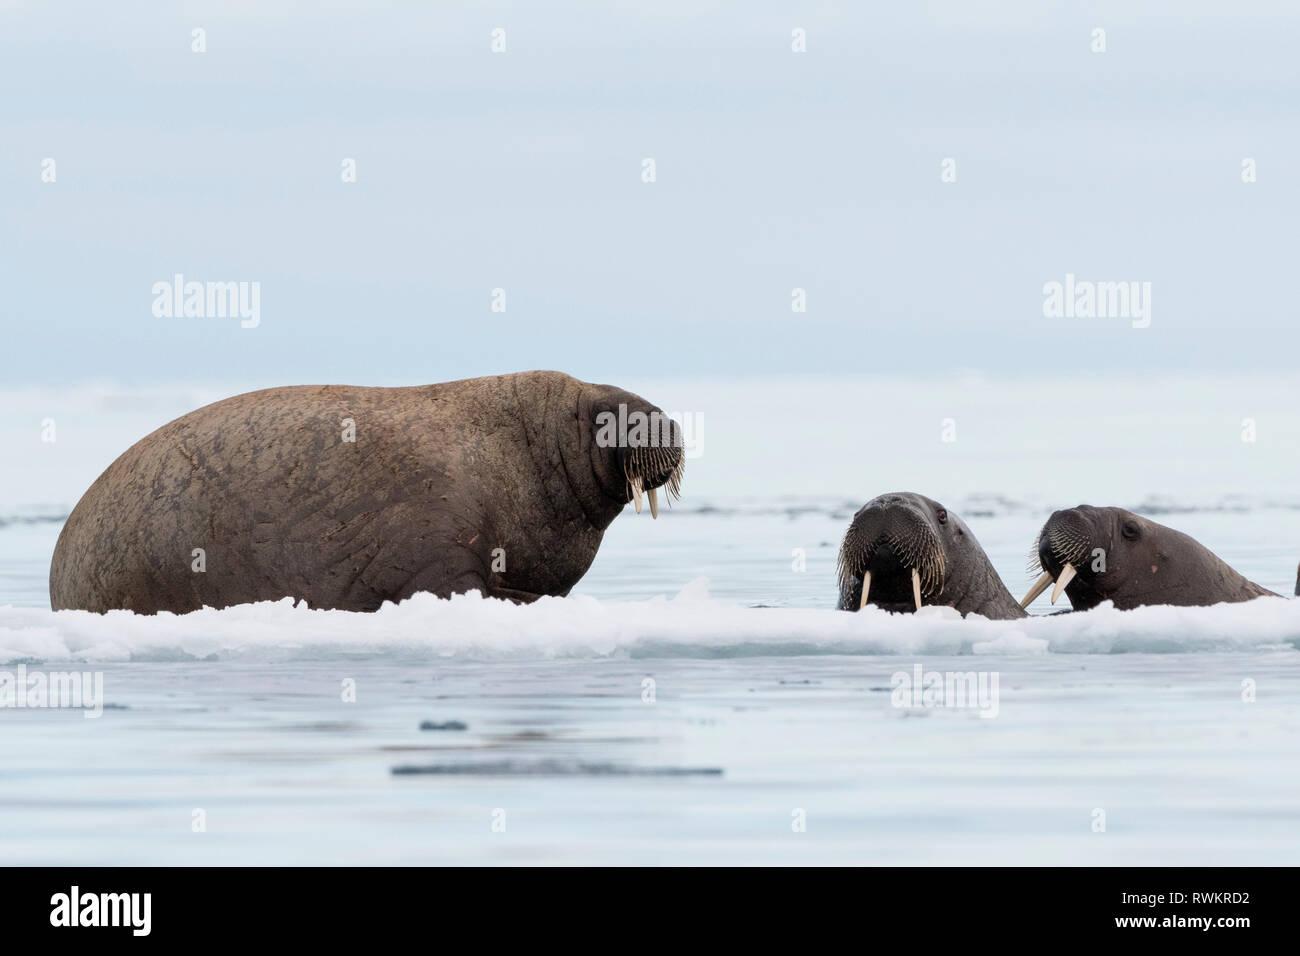 Atlantic walrus (Odobenus rosmarus) on and around icebergs,  Vibebukta, Austfonna, Nordaustlandet, Svalbard, Norway Stock Photo